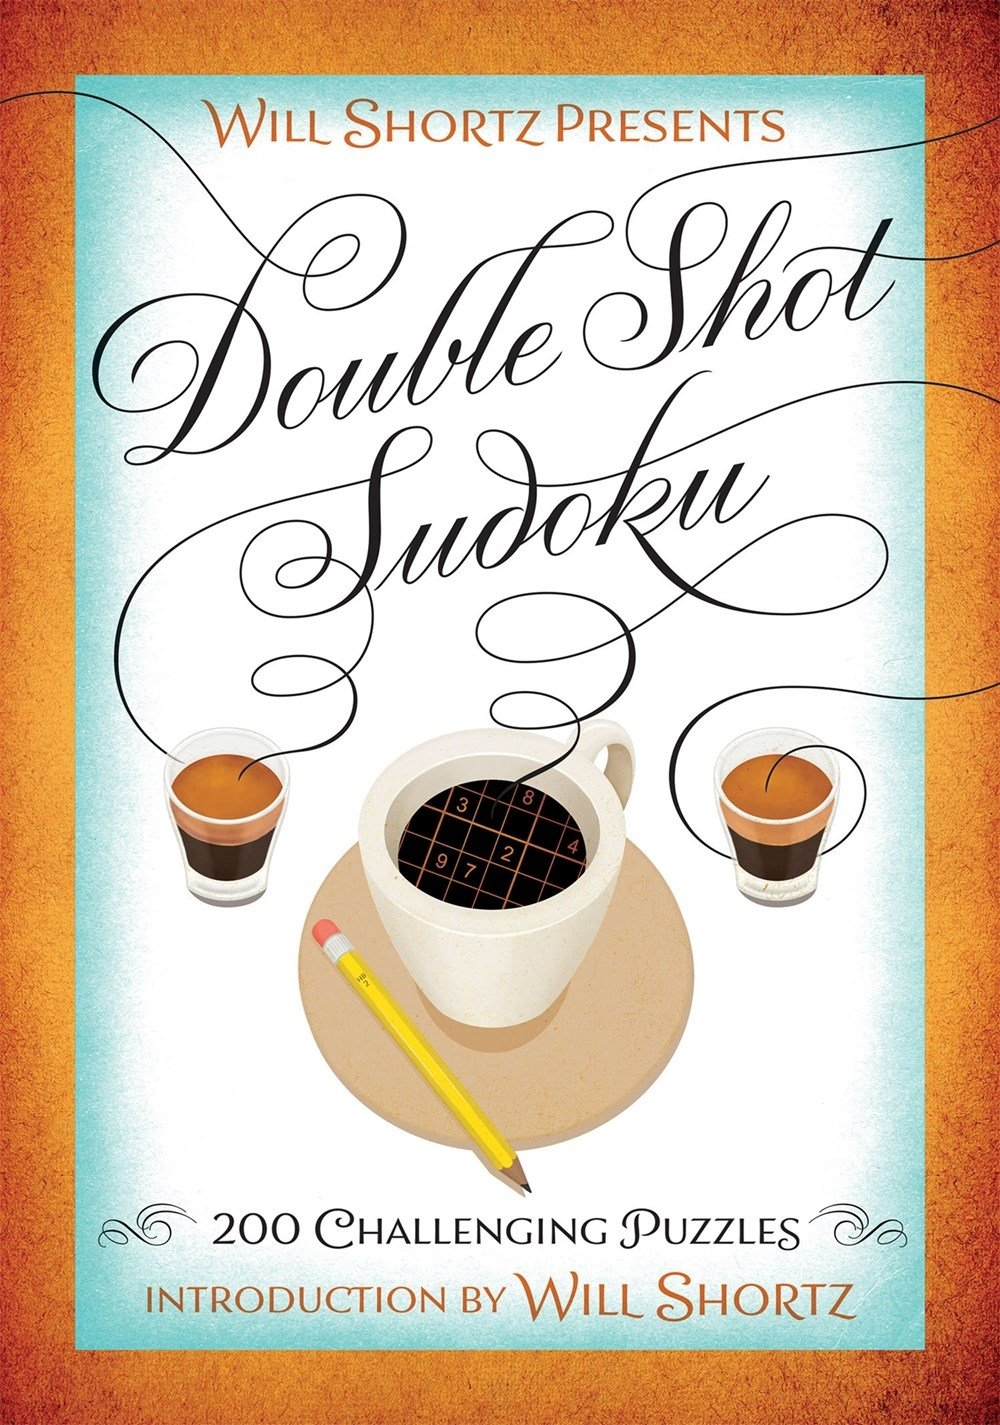 Will Shortz Presents Double Shot Sudoku: 200 Challenging Puzzles: Will  Shortz: 9781250093776: Amazon.com: Books